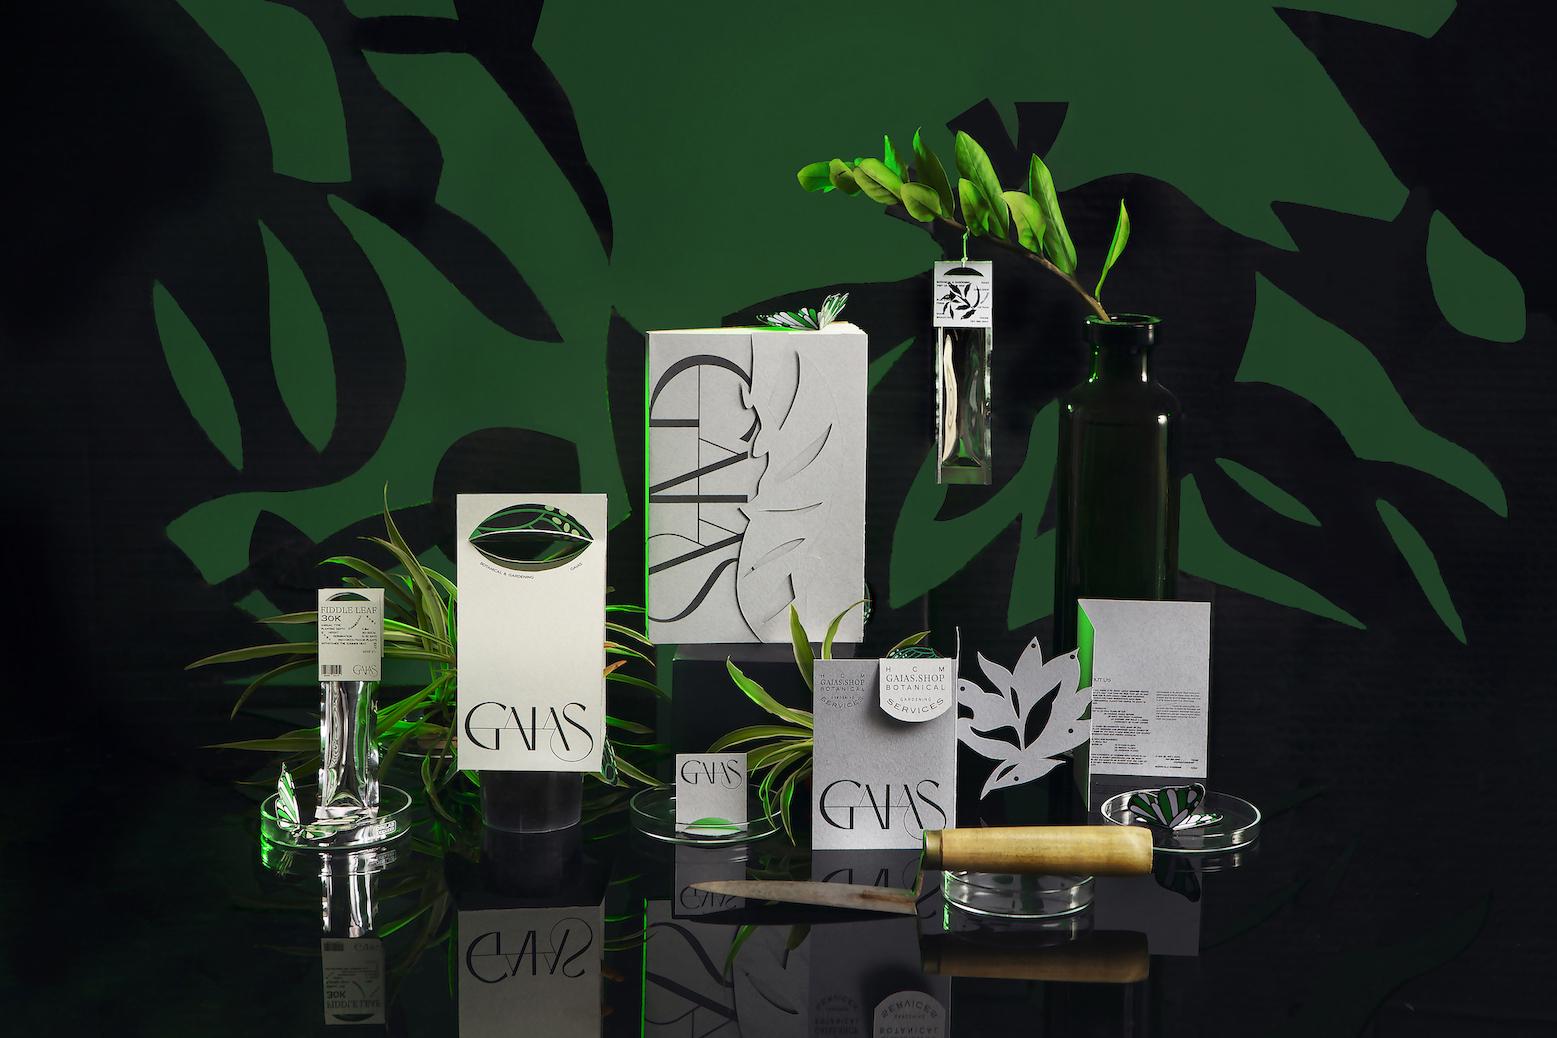 Alex Dang Creates Gaias Branding for a Community of Nature Protectors